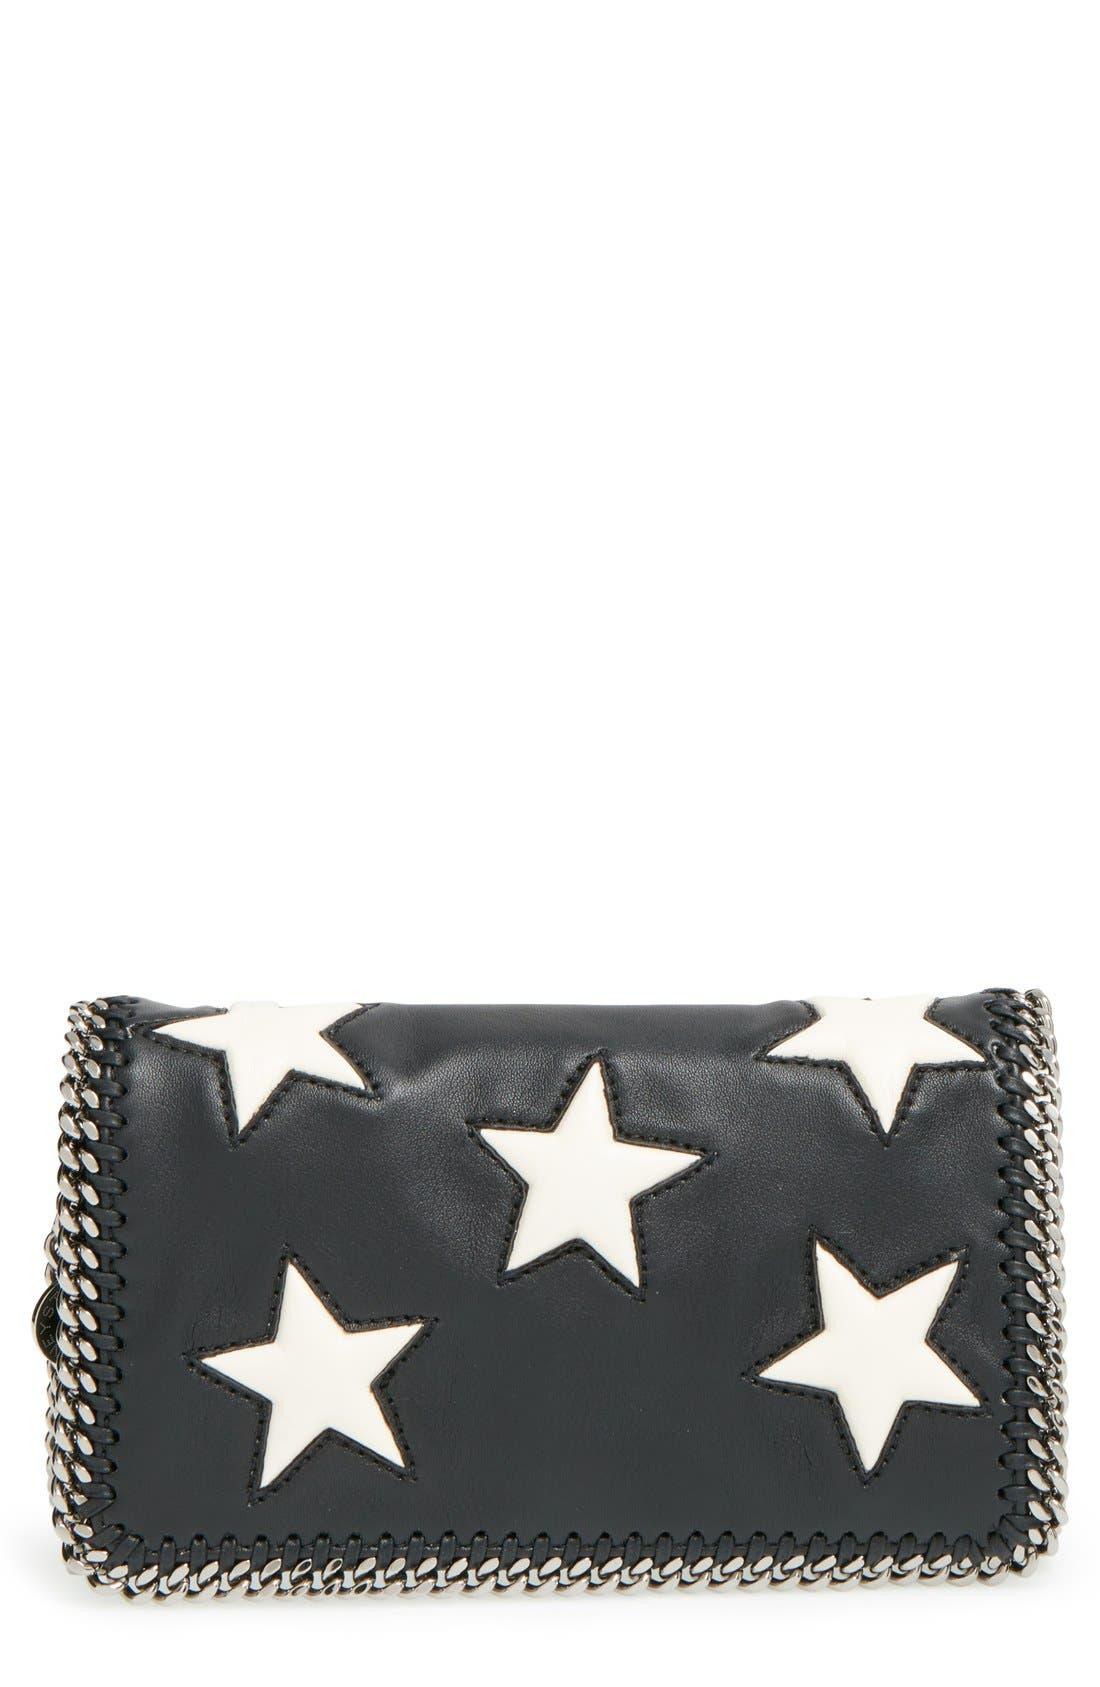 Alternate Image 1 Selected - Stella McCartney 'Falabella' Faux Leather Crossbody Bag